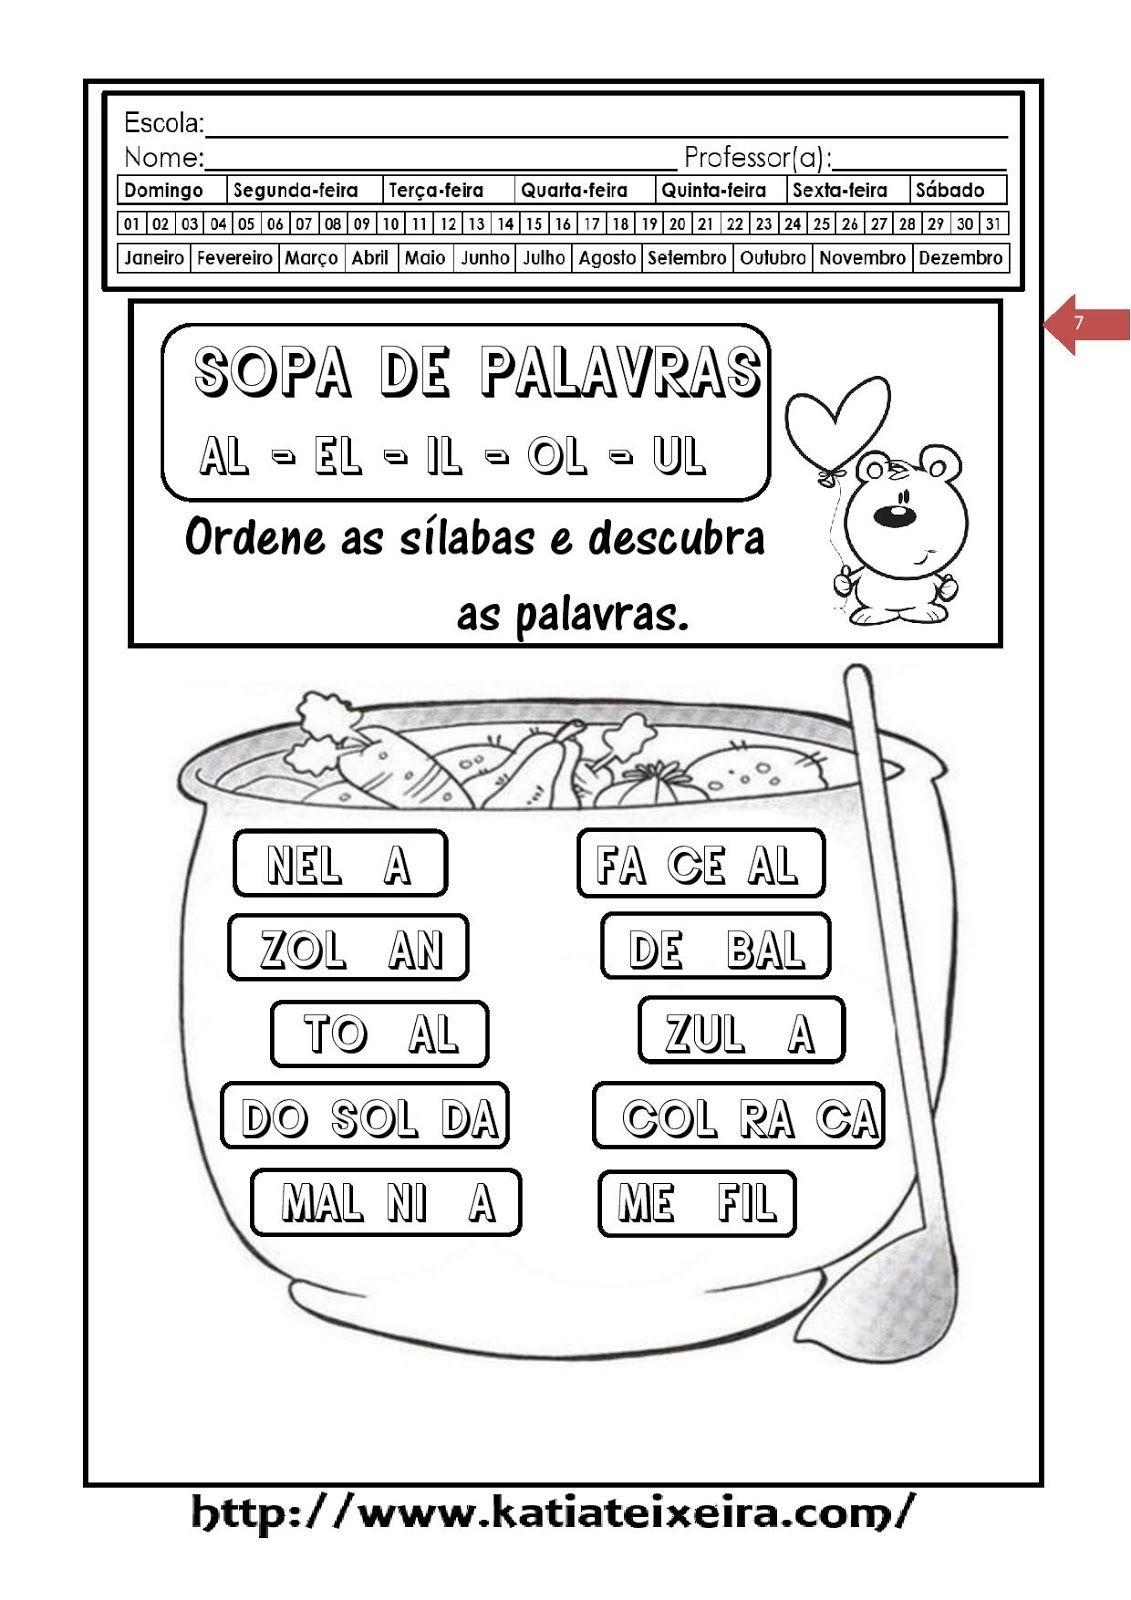 Teia Pedagogica Forme Palavras Al El Il Ol Ul Com